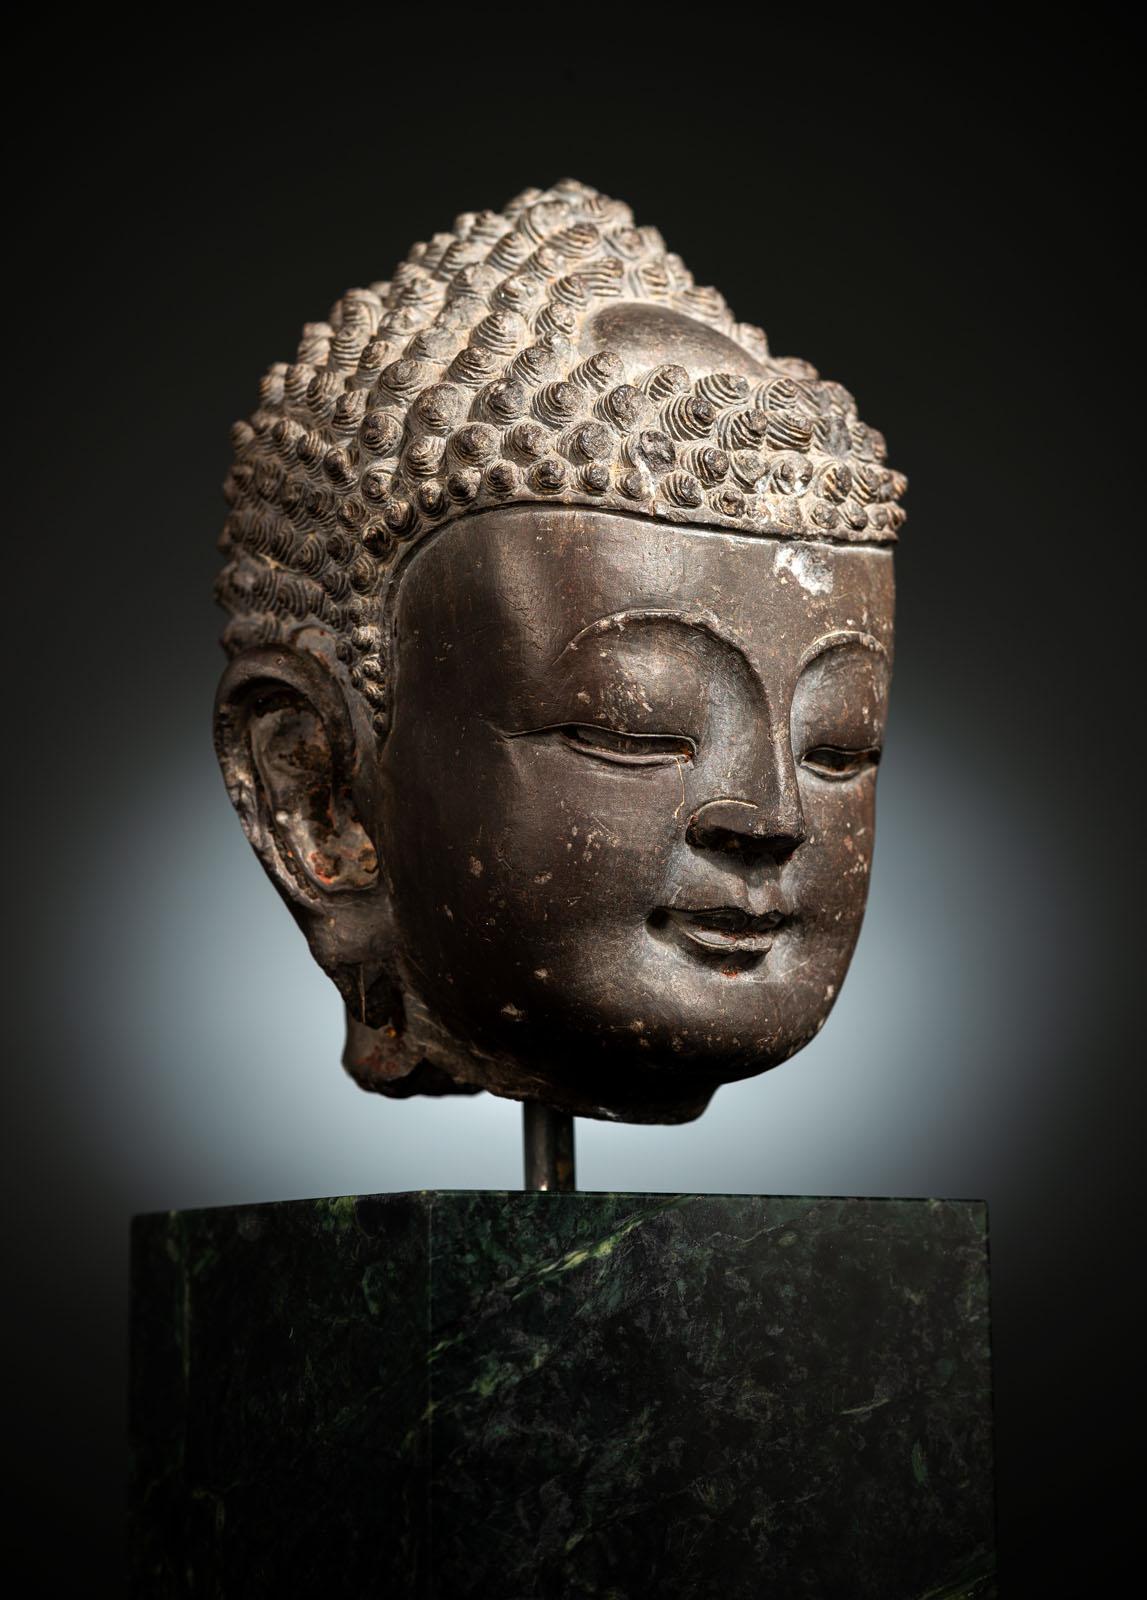 A FINE CARVED GREY-BROWN CARVED STONE HEAD OF BUDDHA SHAKYAMUNI - Image 3 of 10